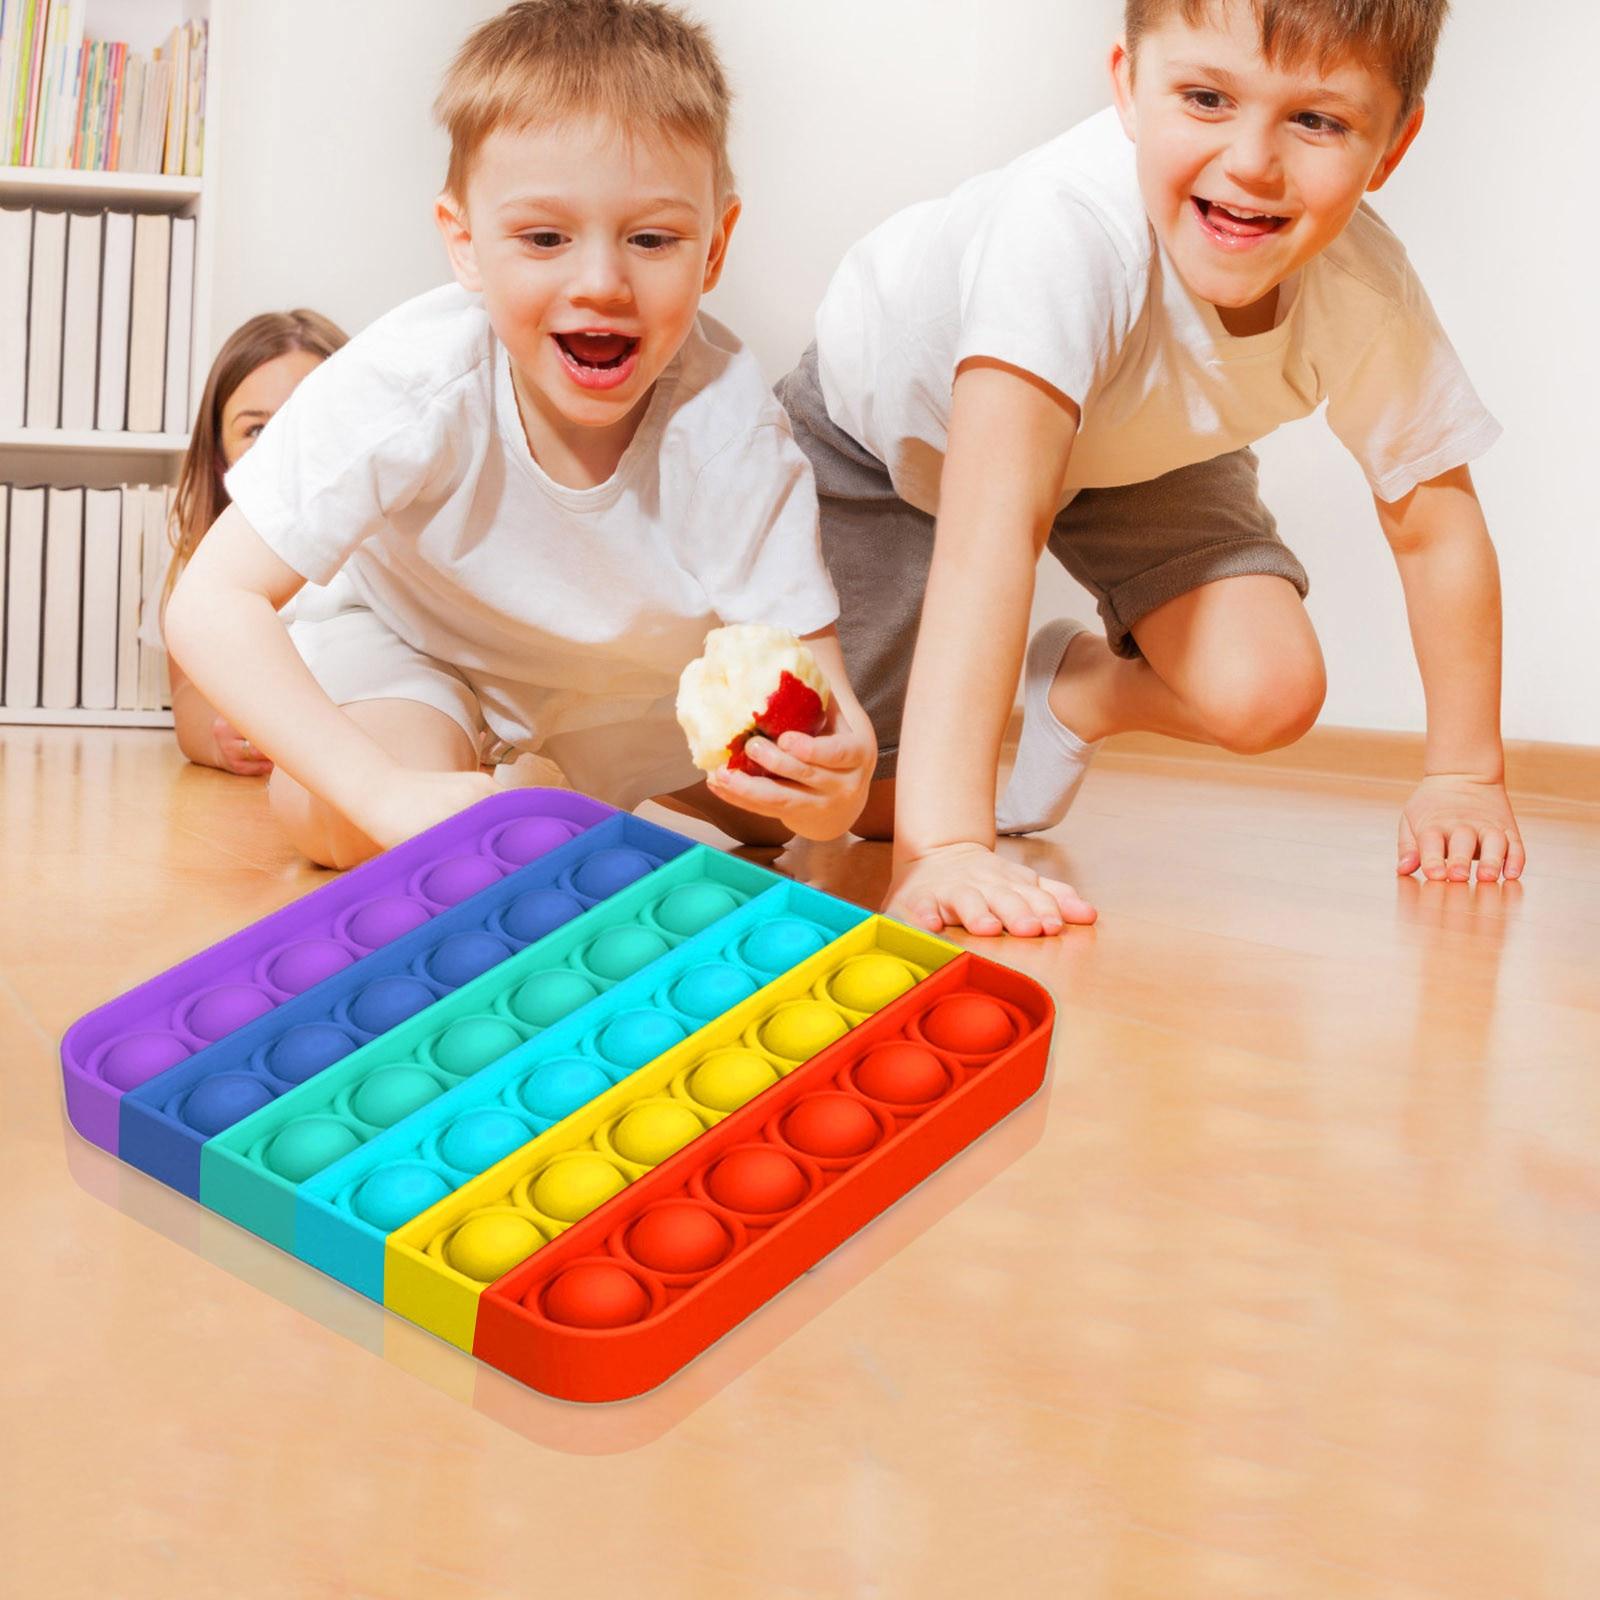 Toy Fidget-Toys Sensory-Toy Autism Needs-Stress Push Bubble Reliever Popit Special Kids img4